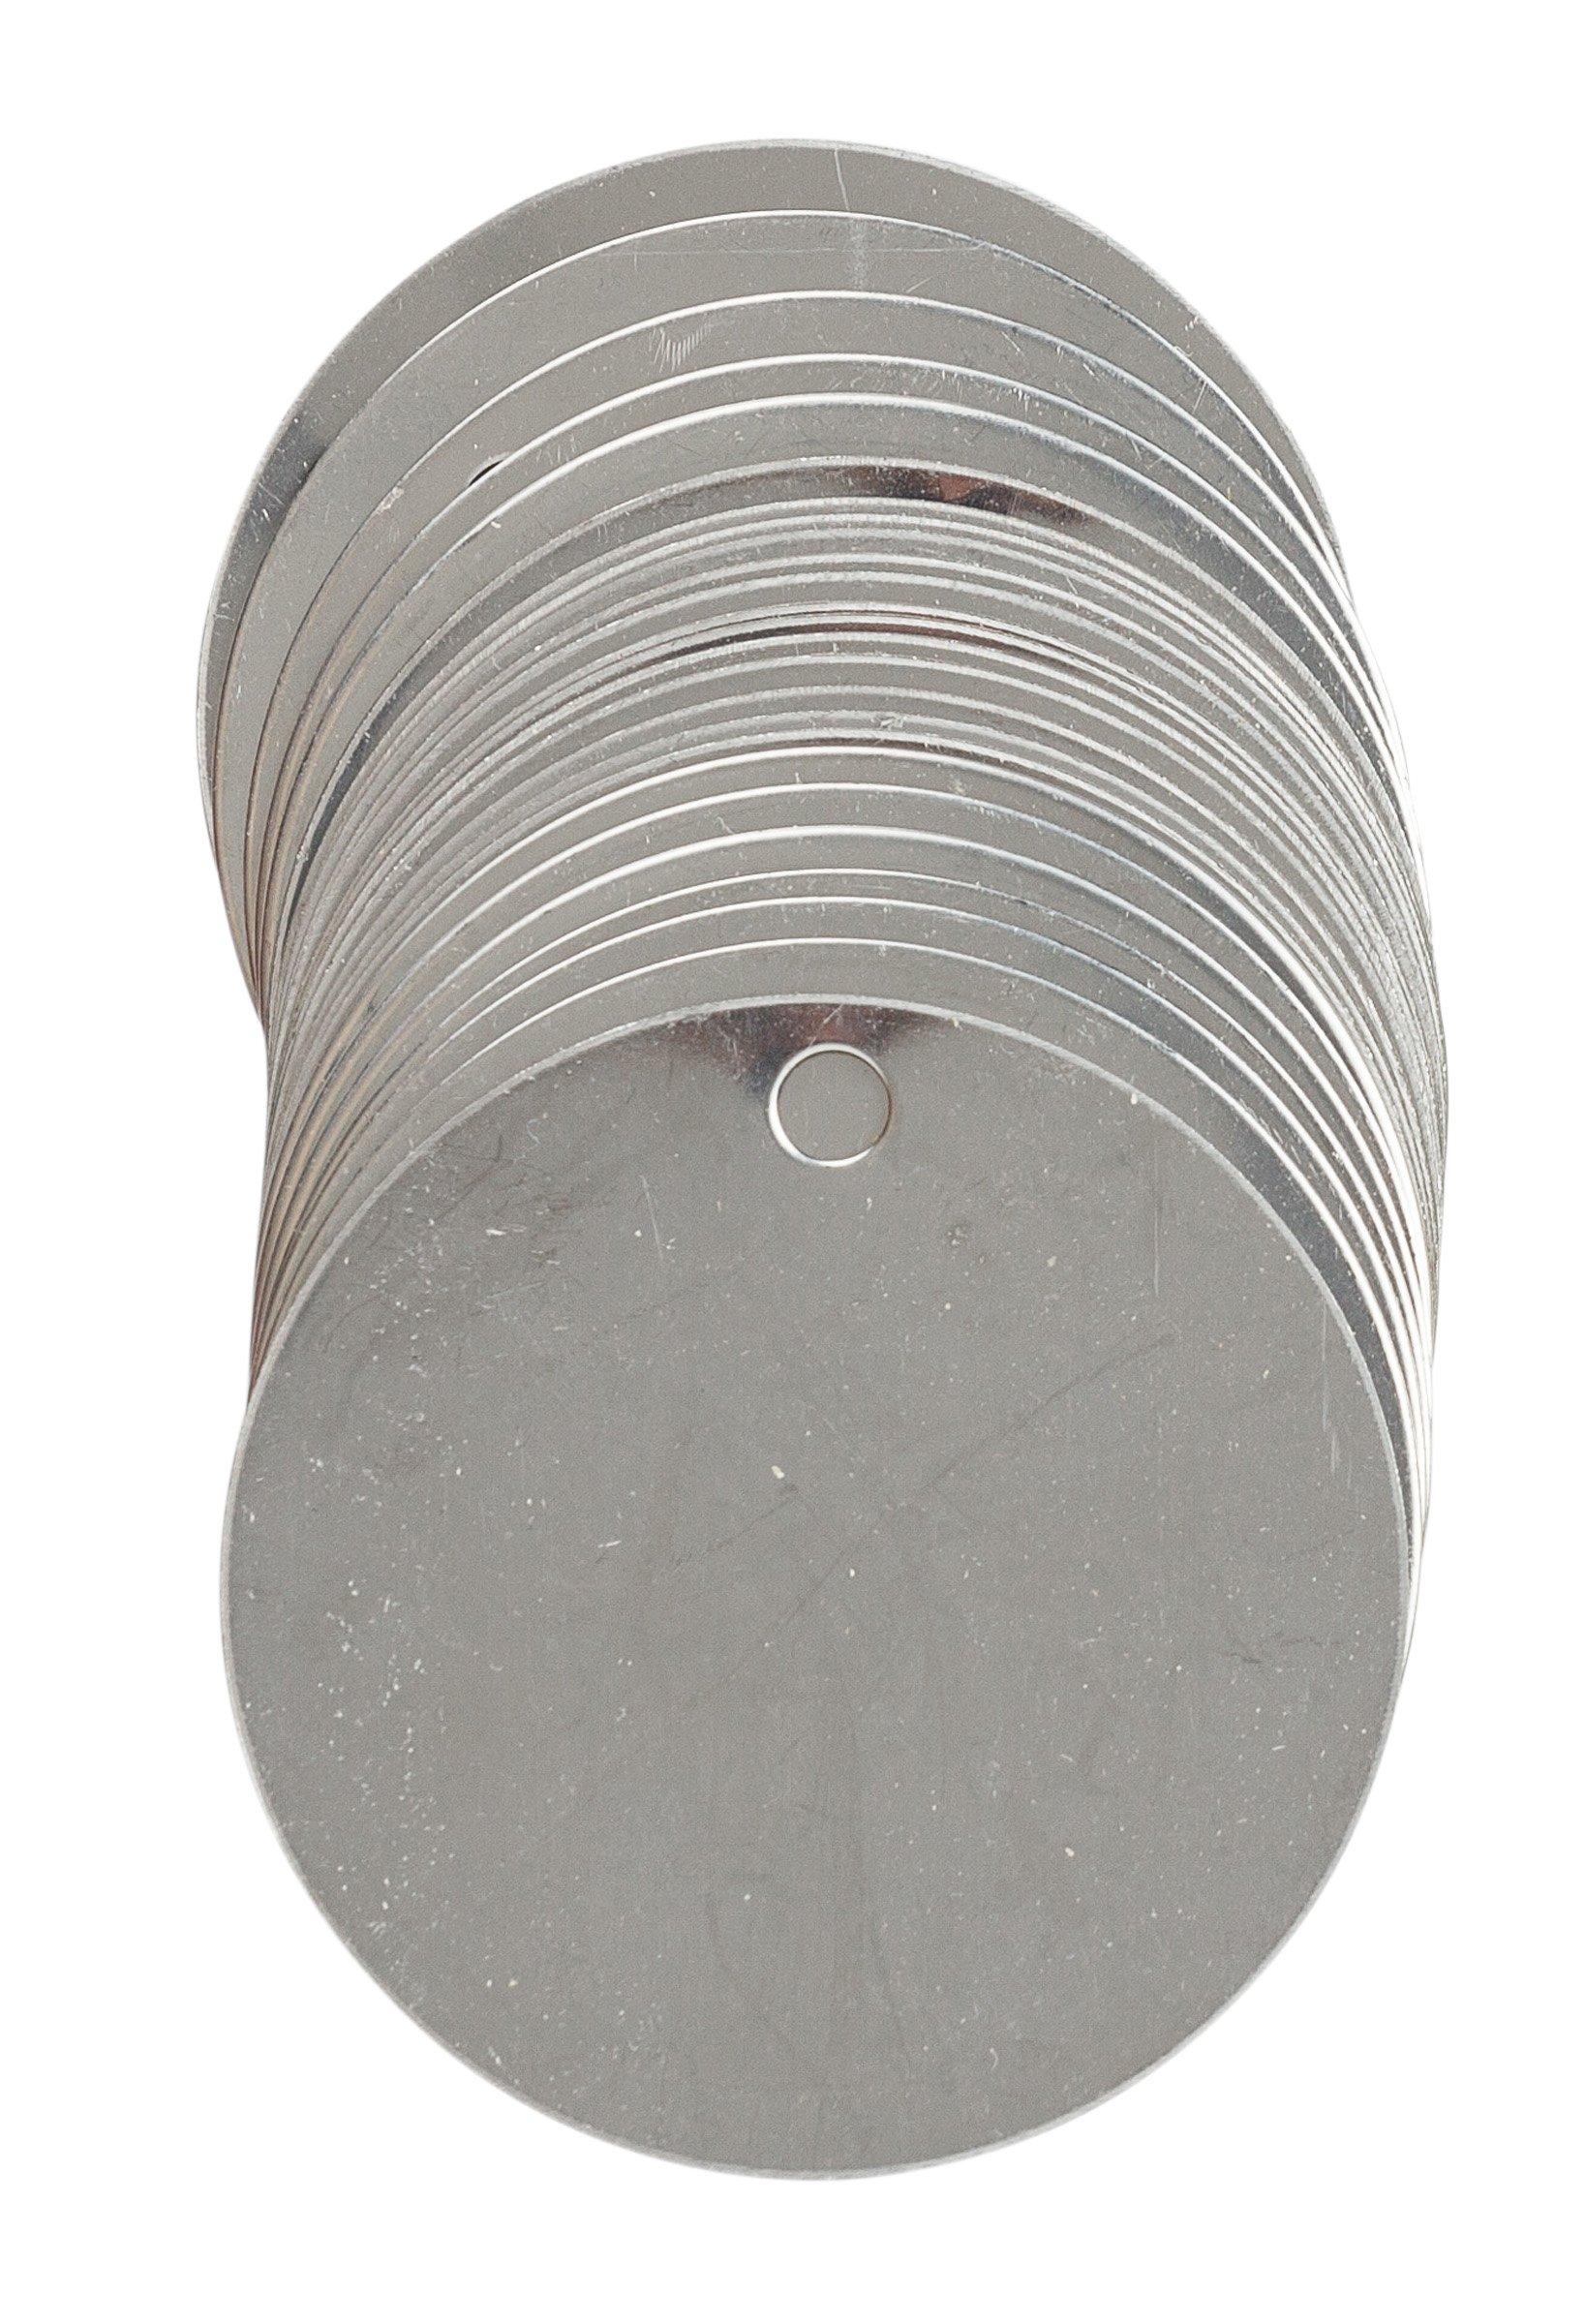 Brady 44400 Stock Blank Stainless Steel Tags, Stainless Steel, 1 1/2'' diameter 1 1/2'' diameter